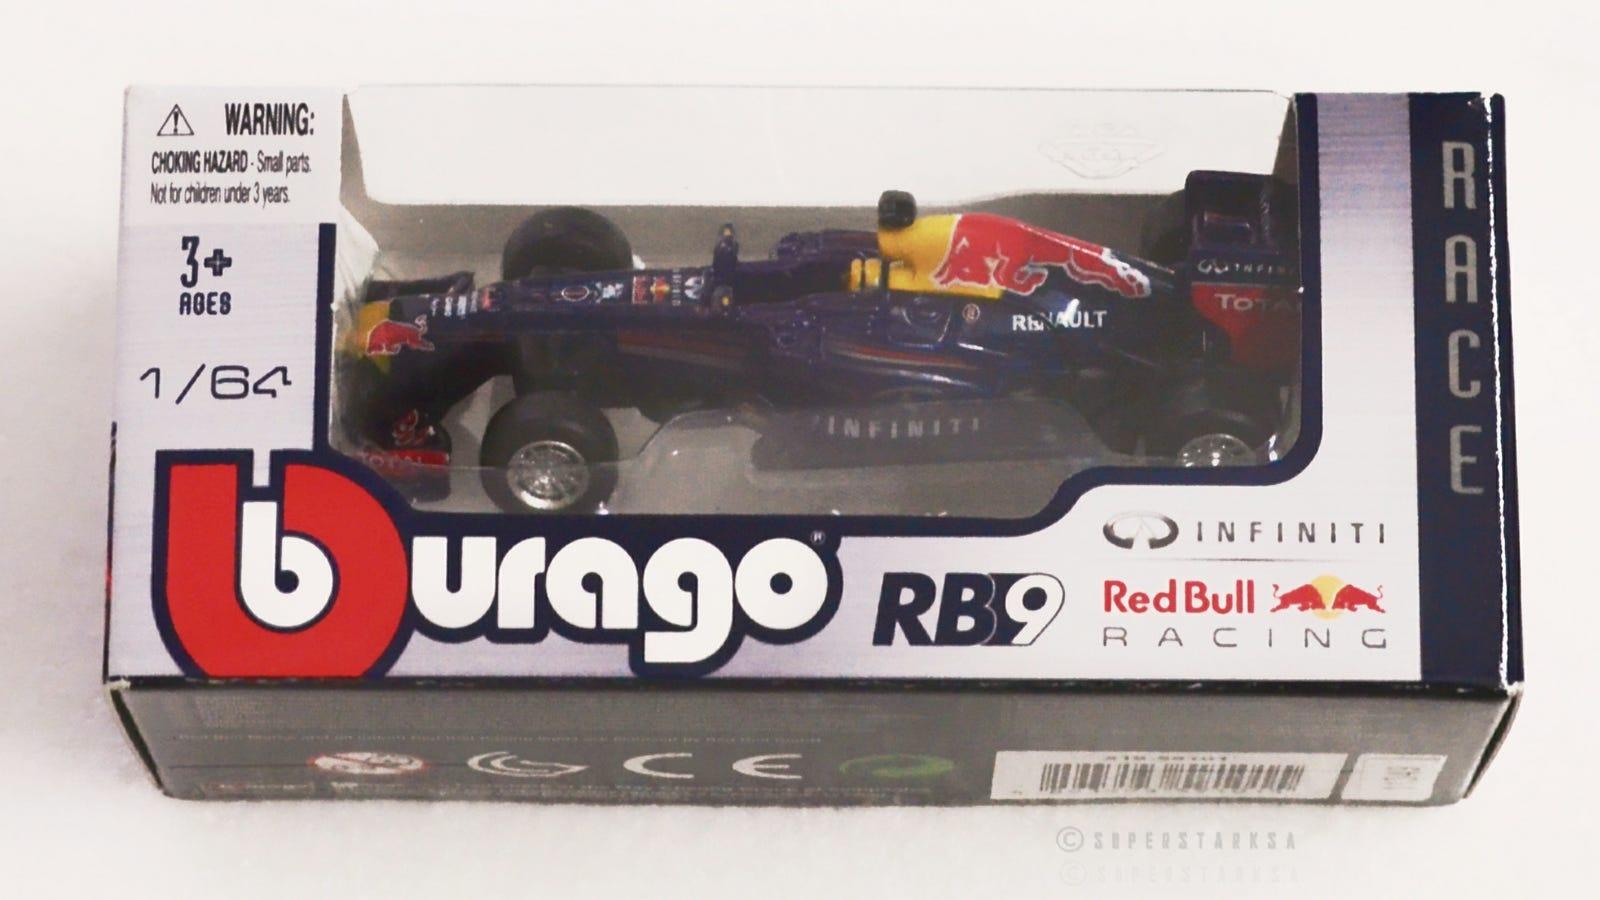 Sebastian Vettel Red Bull RB9 #1 World Champion formula 1 2013 1:64 Bburago